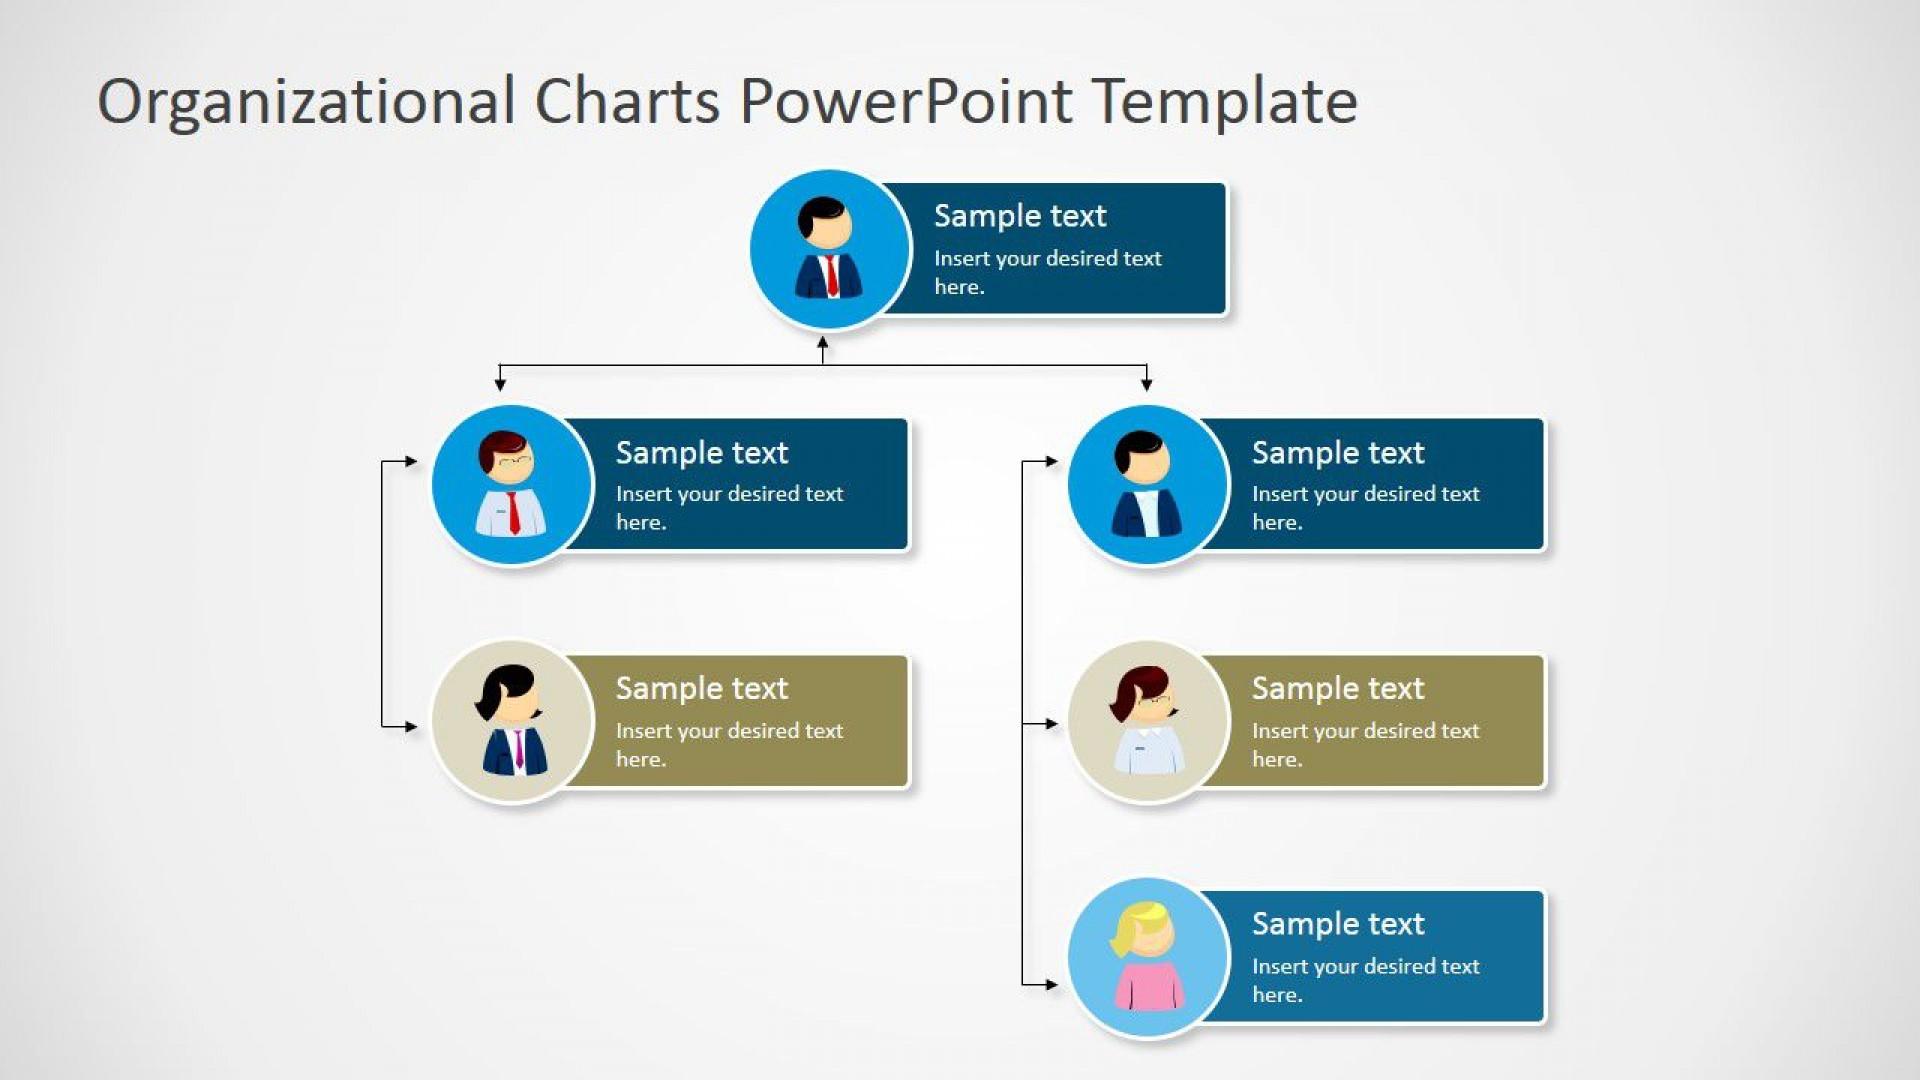 002 Outstanding Org Chart Template Powerpoint High Resolution  Organization Free Download Organizational 2010 20131920